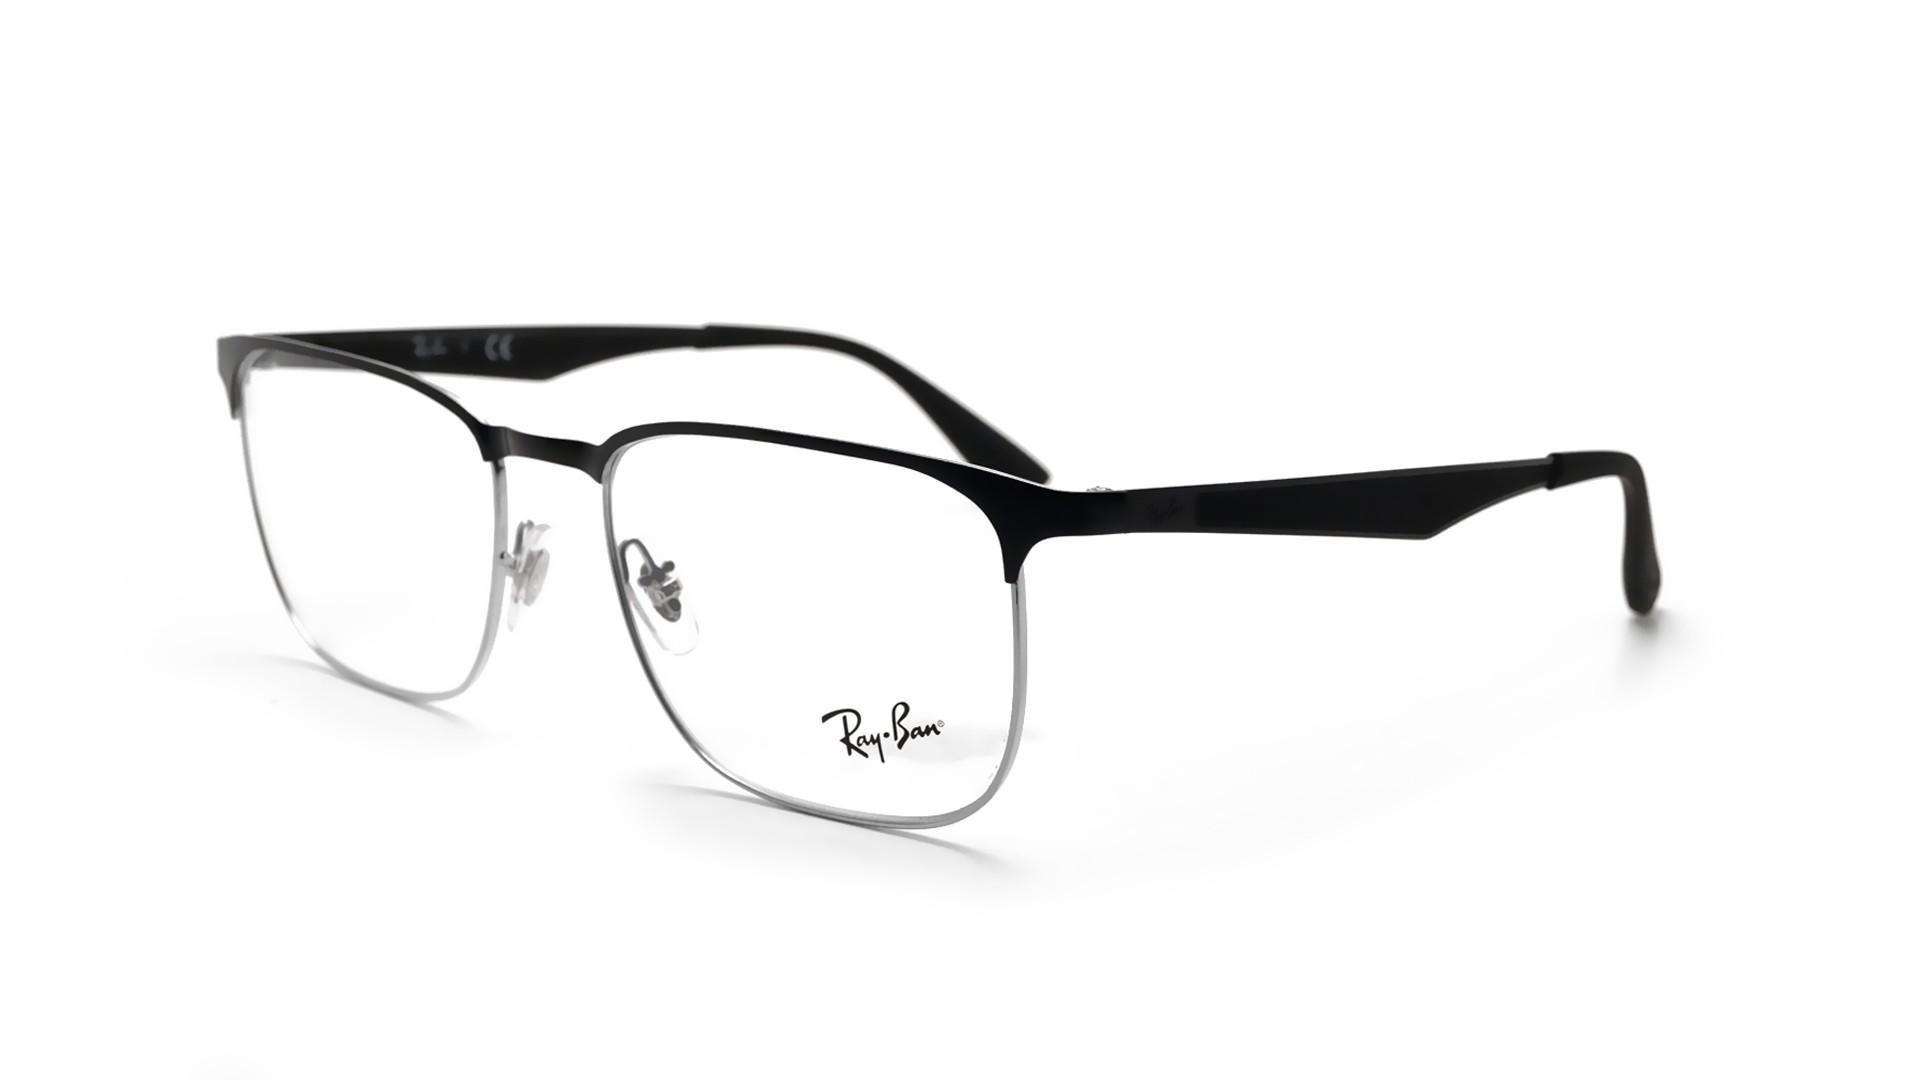 clubmaster ray ban eyeglasses  Ban Clubmaster Black RX6363 RB6363 2861 54-18